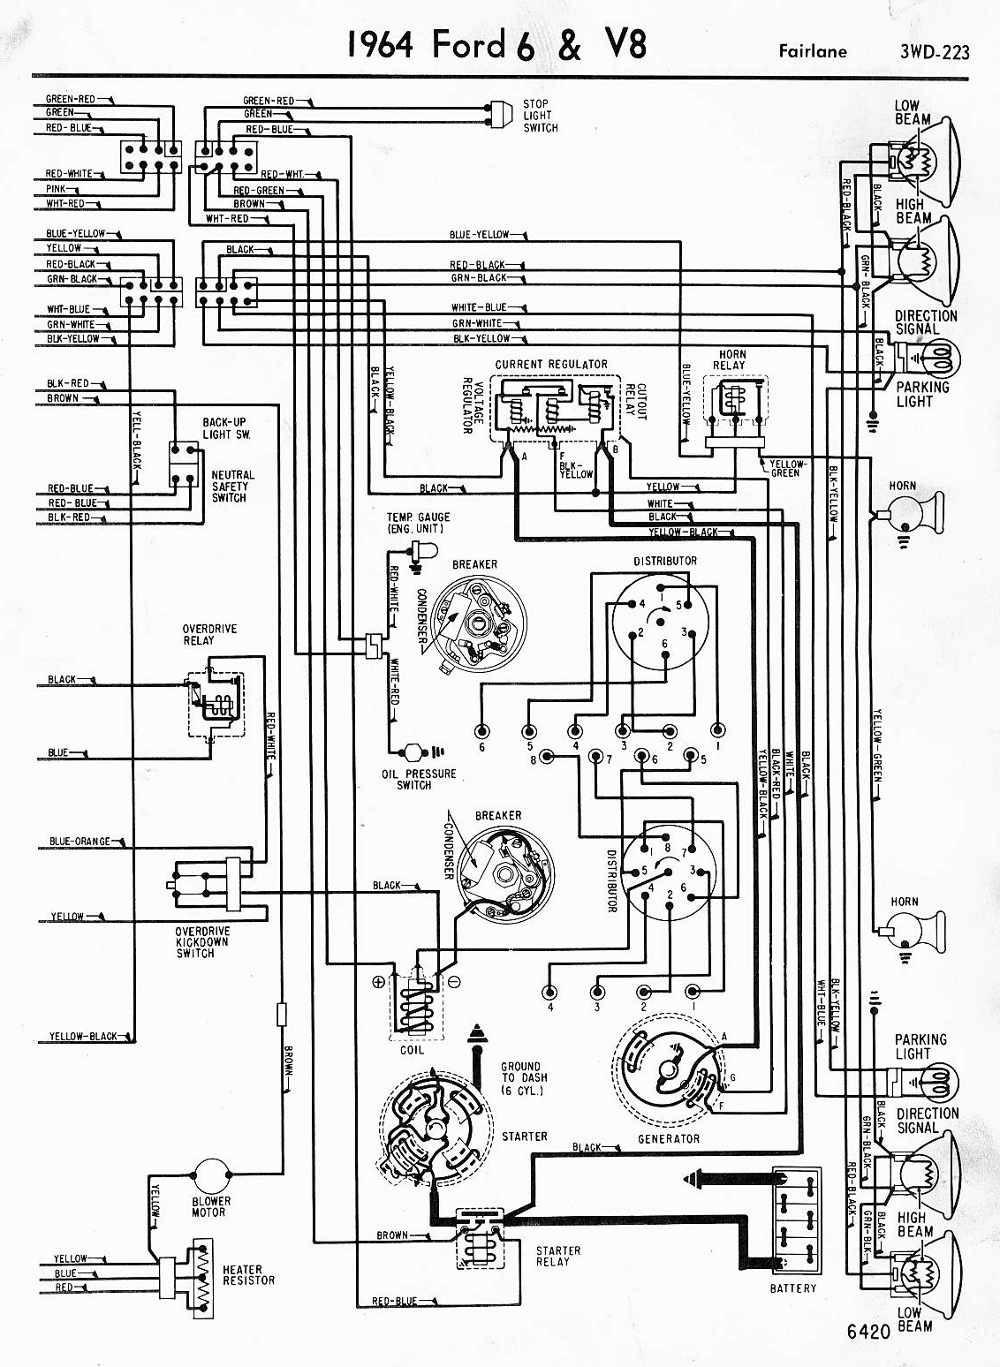 hight resolution of 1955 ford customline wiring diagram trusted wiring diagram ford truck wiring diagrams 1955 ford customline wiring